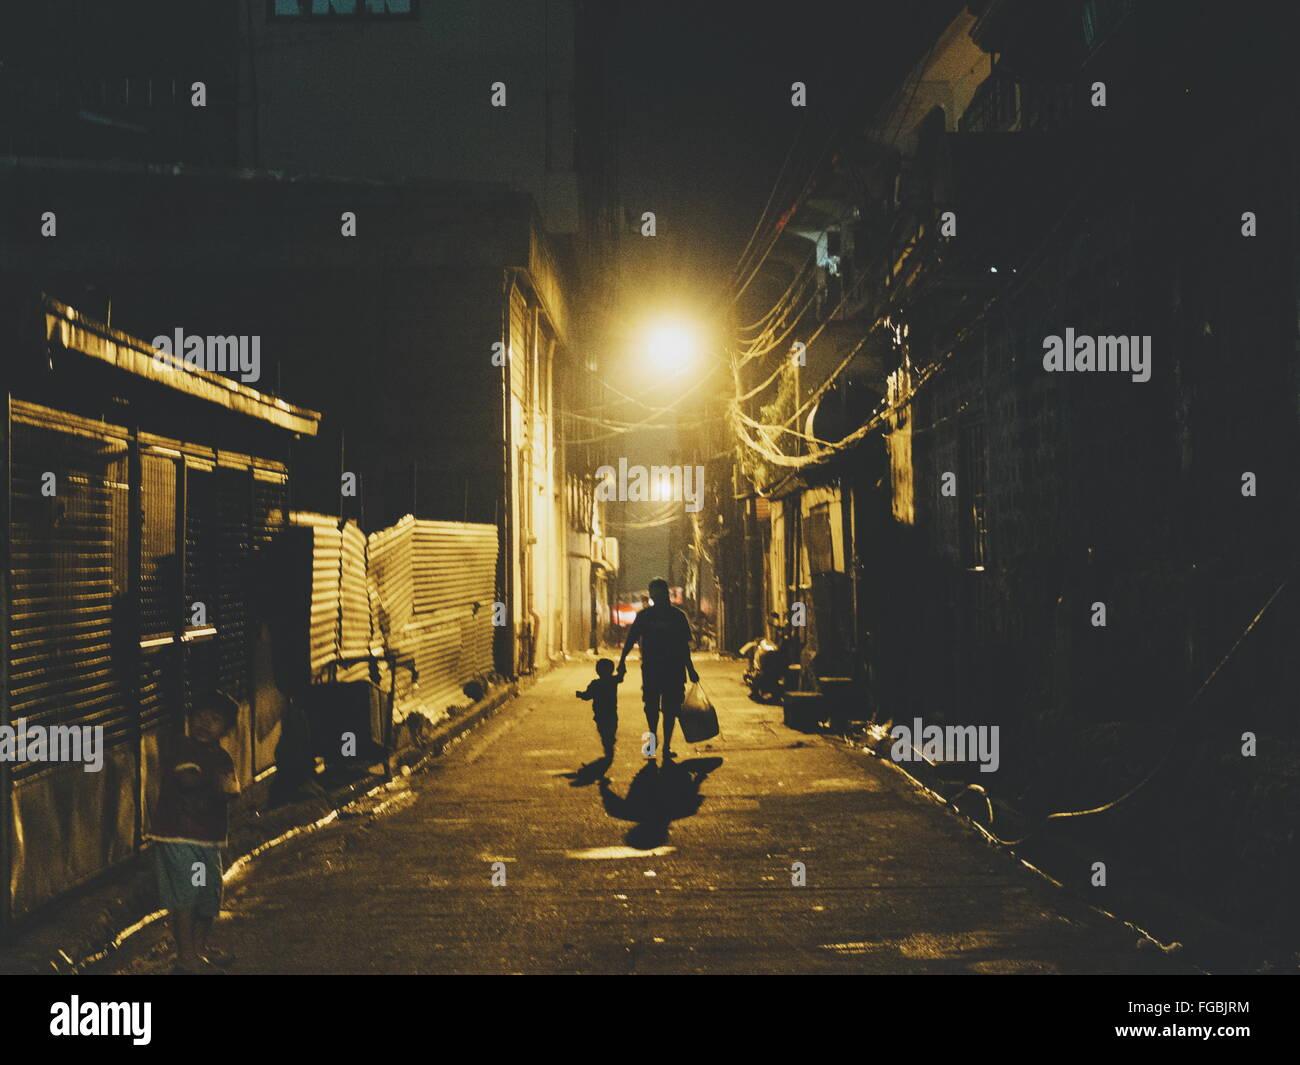 Mother Walking With Child On Illuminated Street At Night - Stock Image